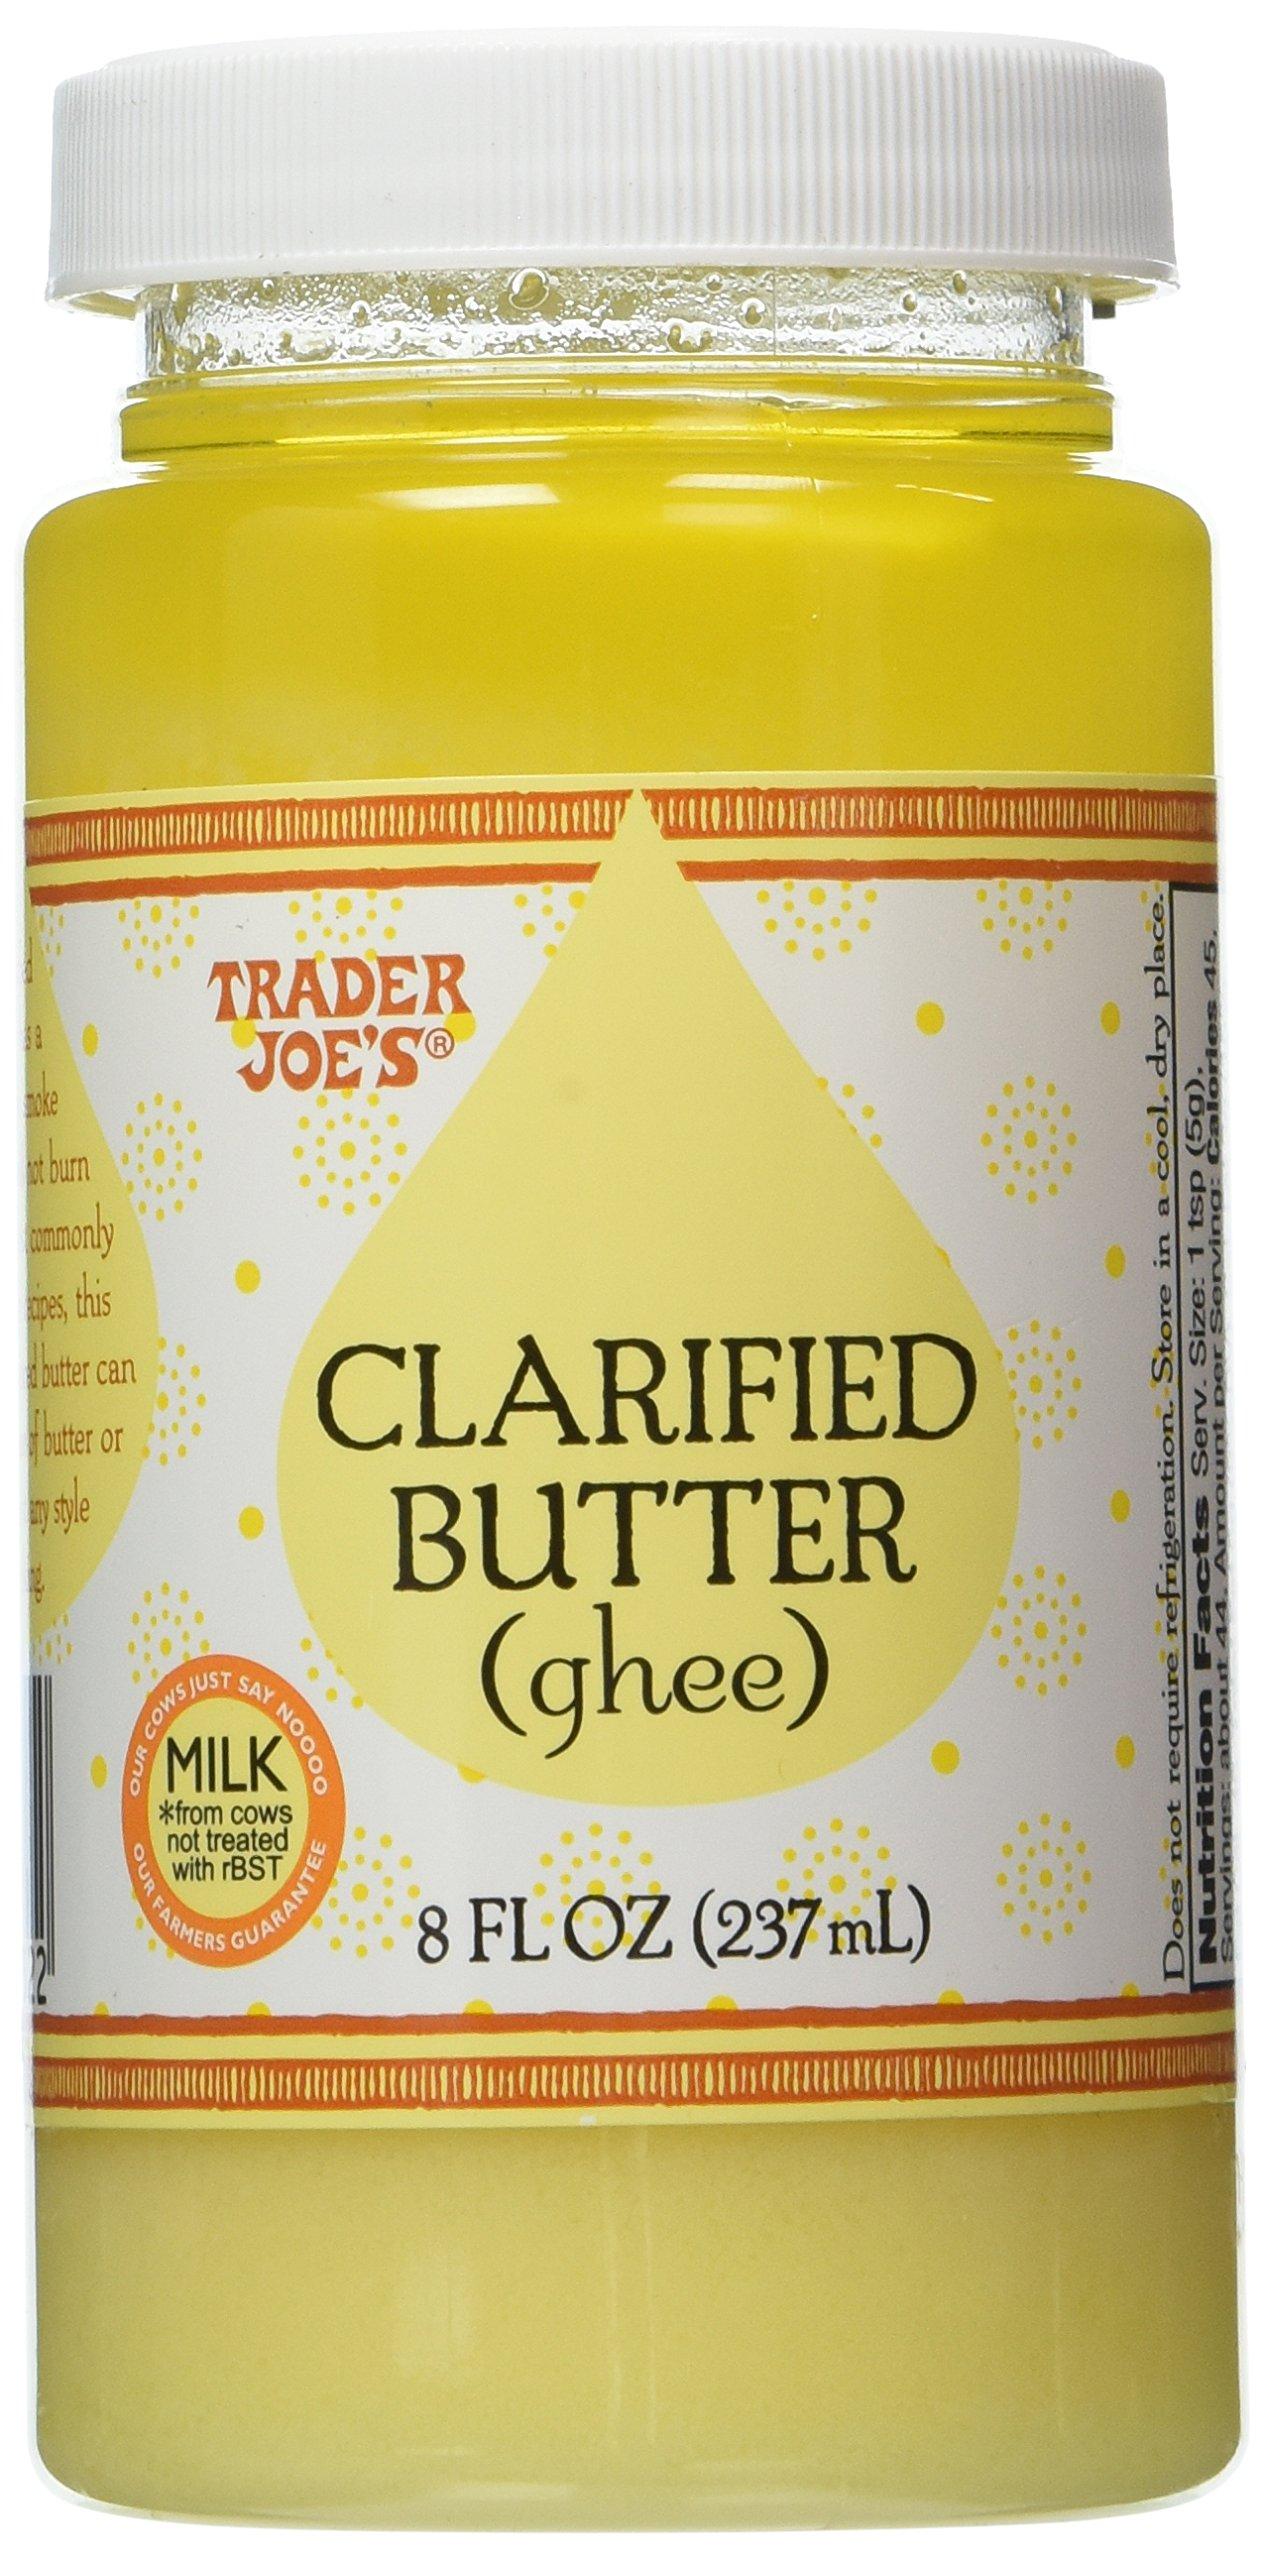 Trader Joe's Clarified Butter (Ghee) (2 - 8 oz Jars)